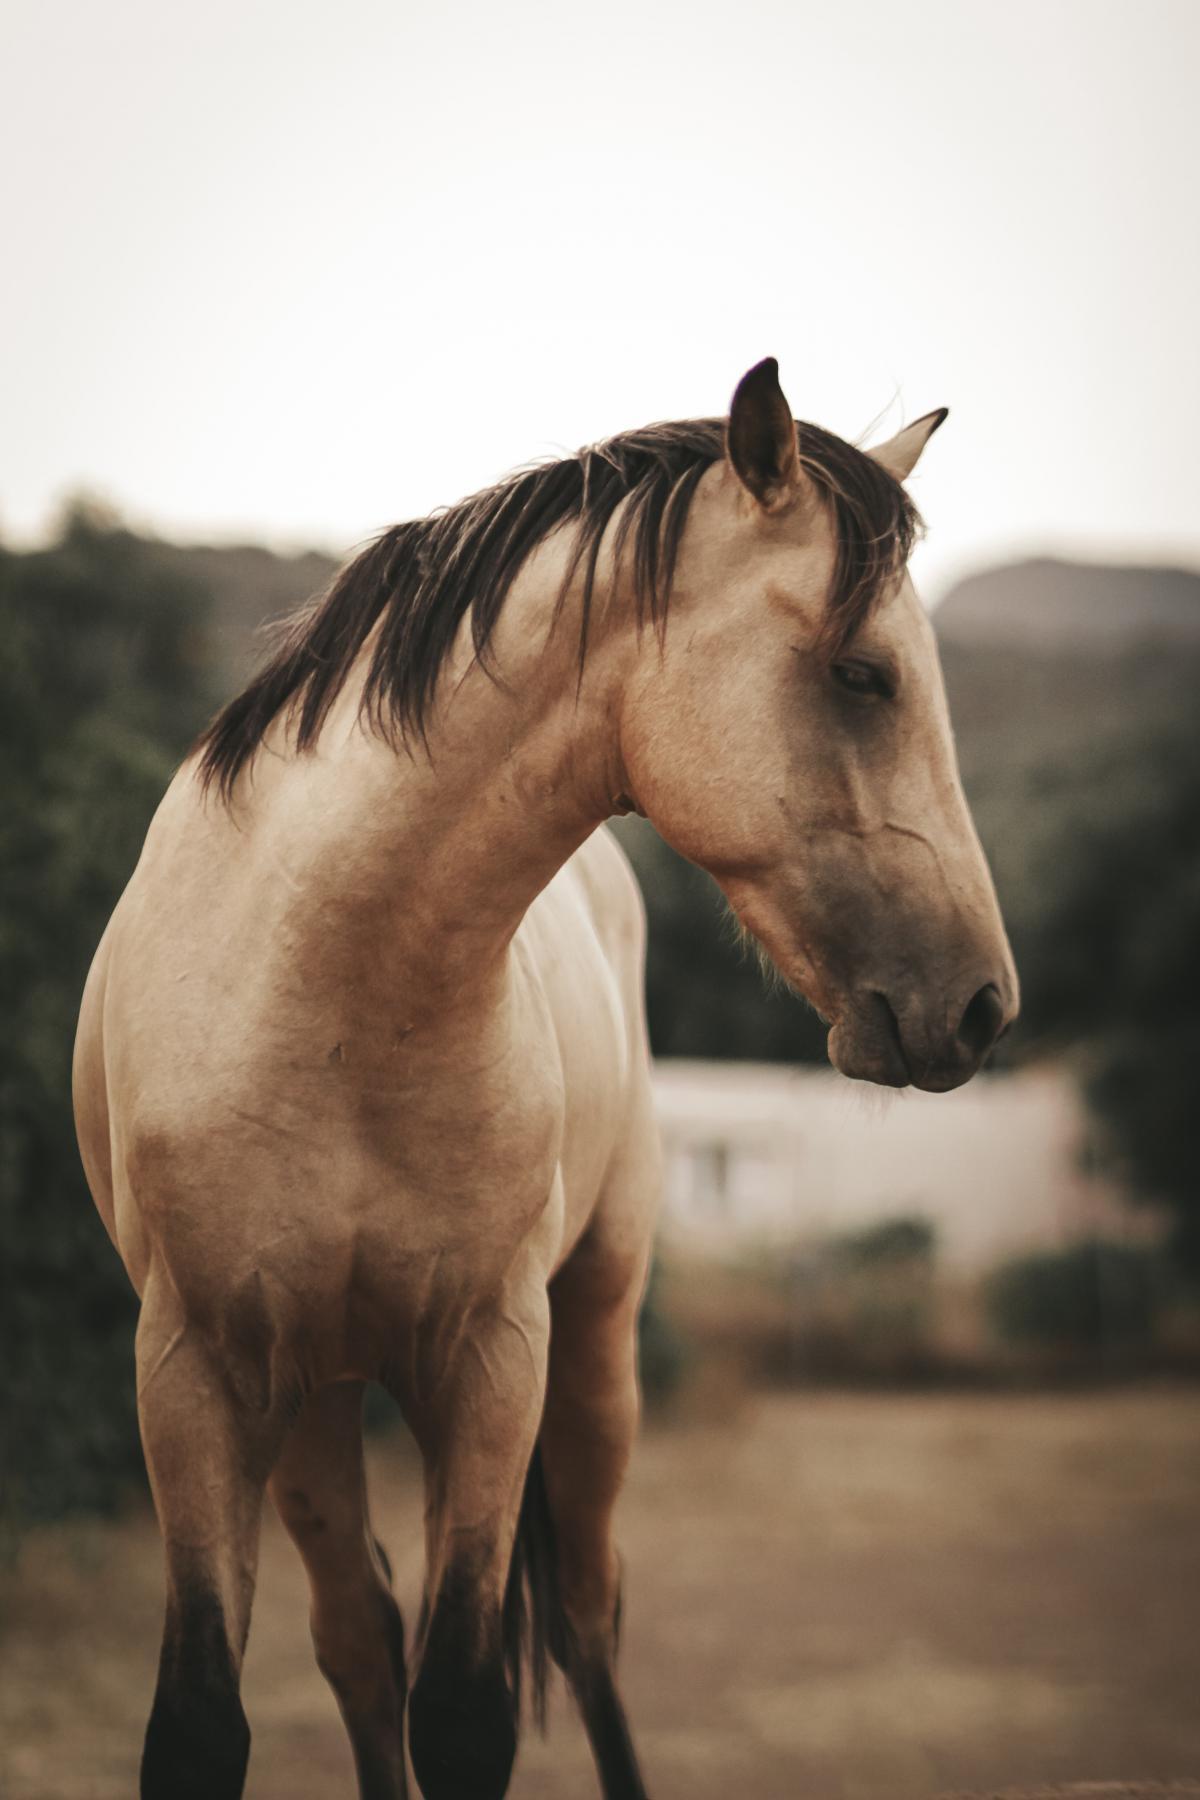 Horse Thoroughbred Animal